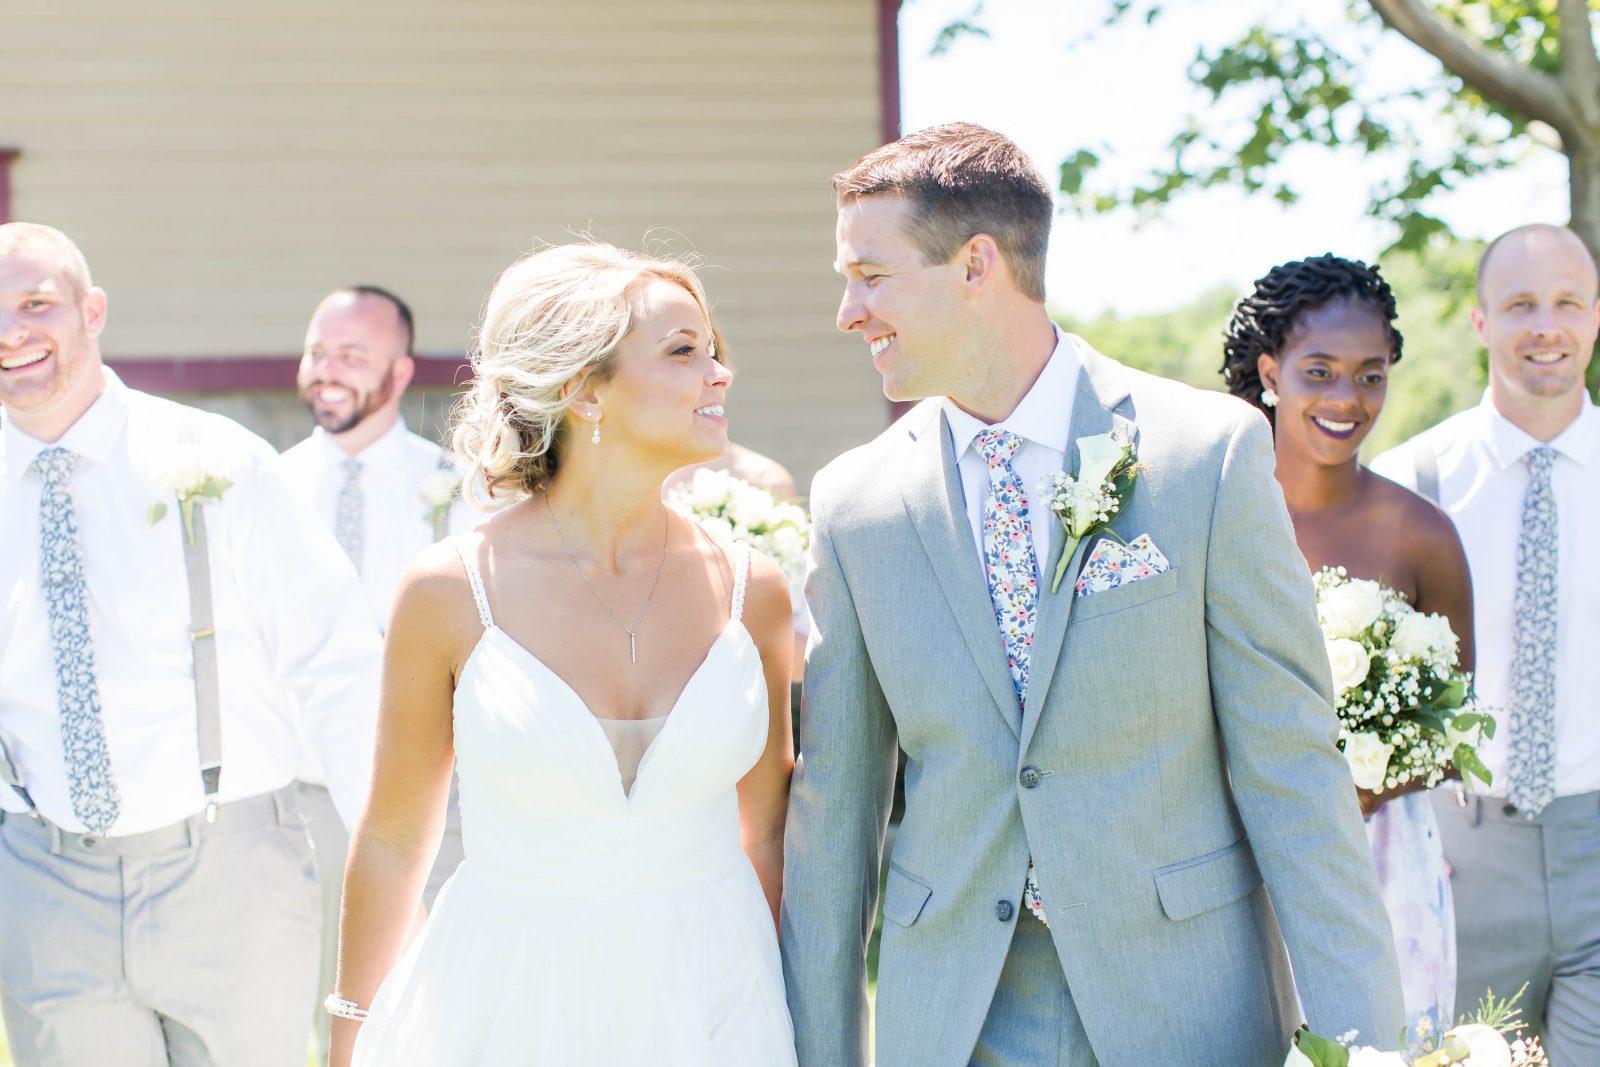 peacock-ridge-summer-wedding-photographer-akron-ohio-loren-jackson-photography-58